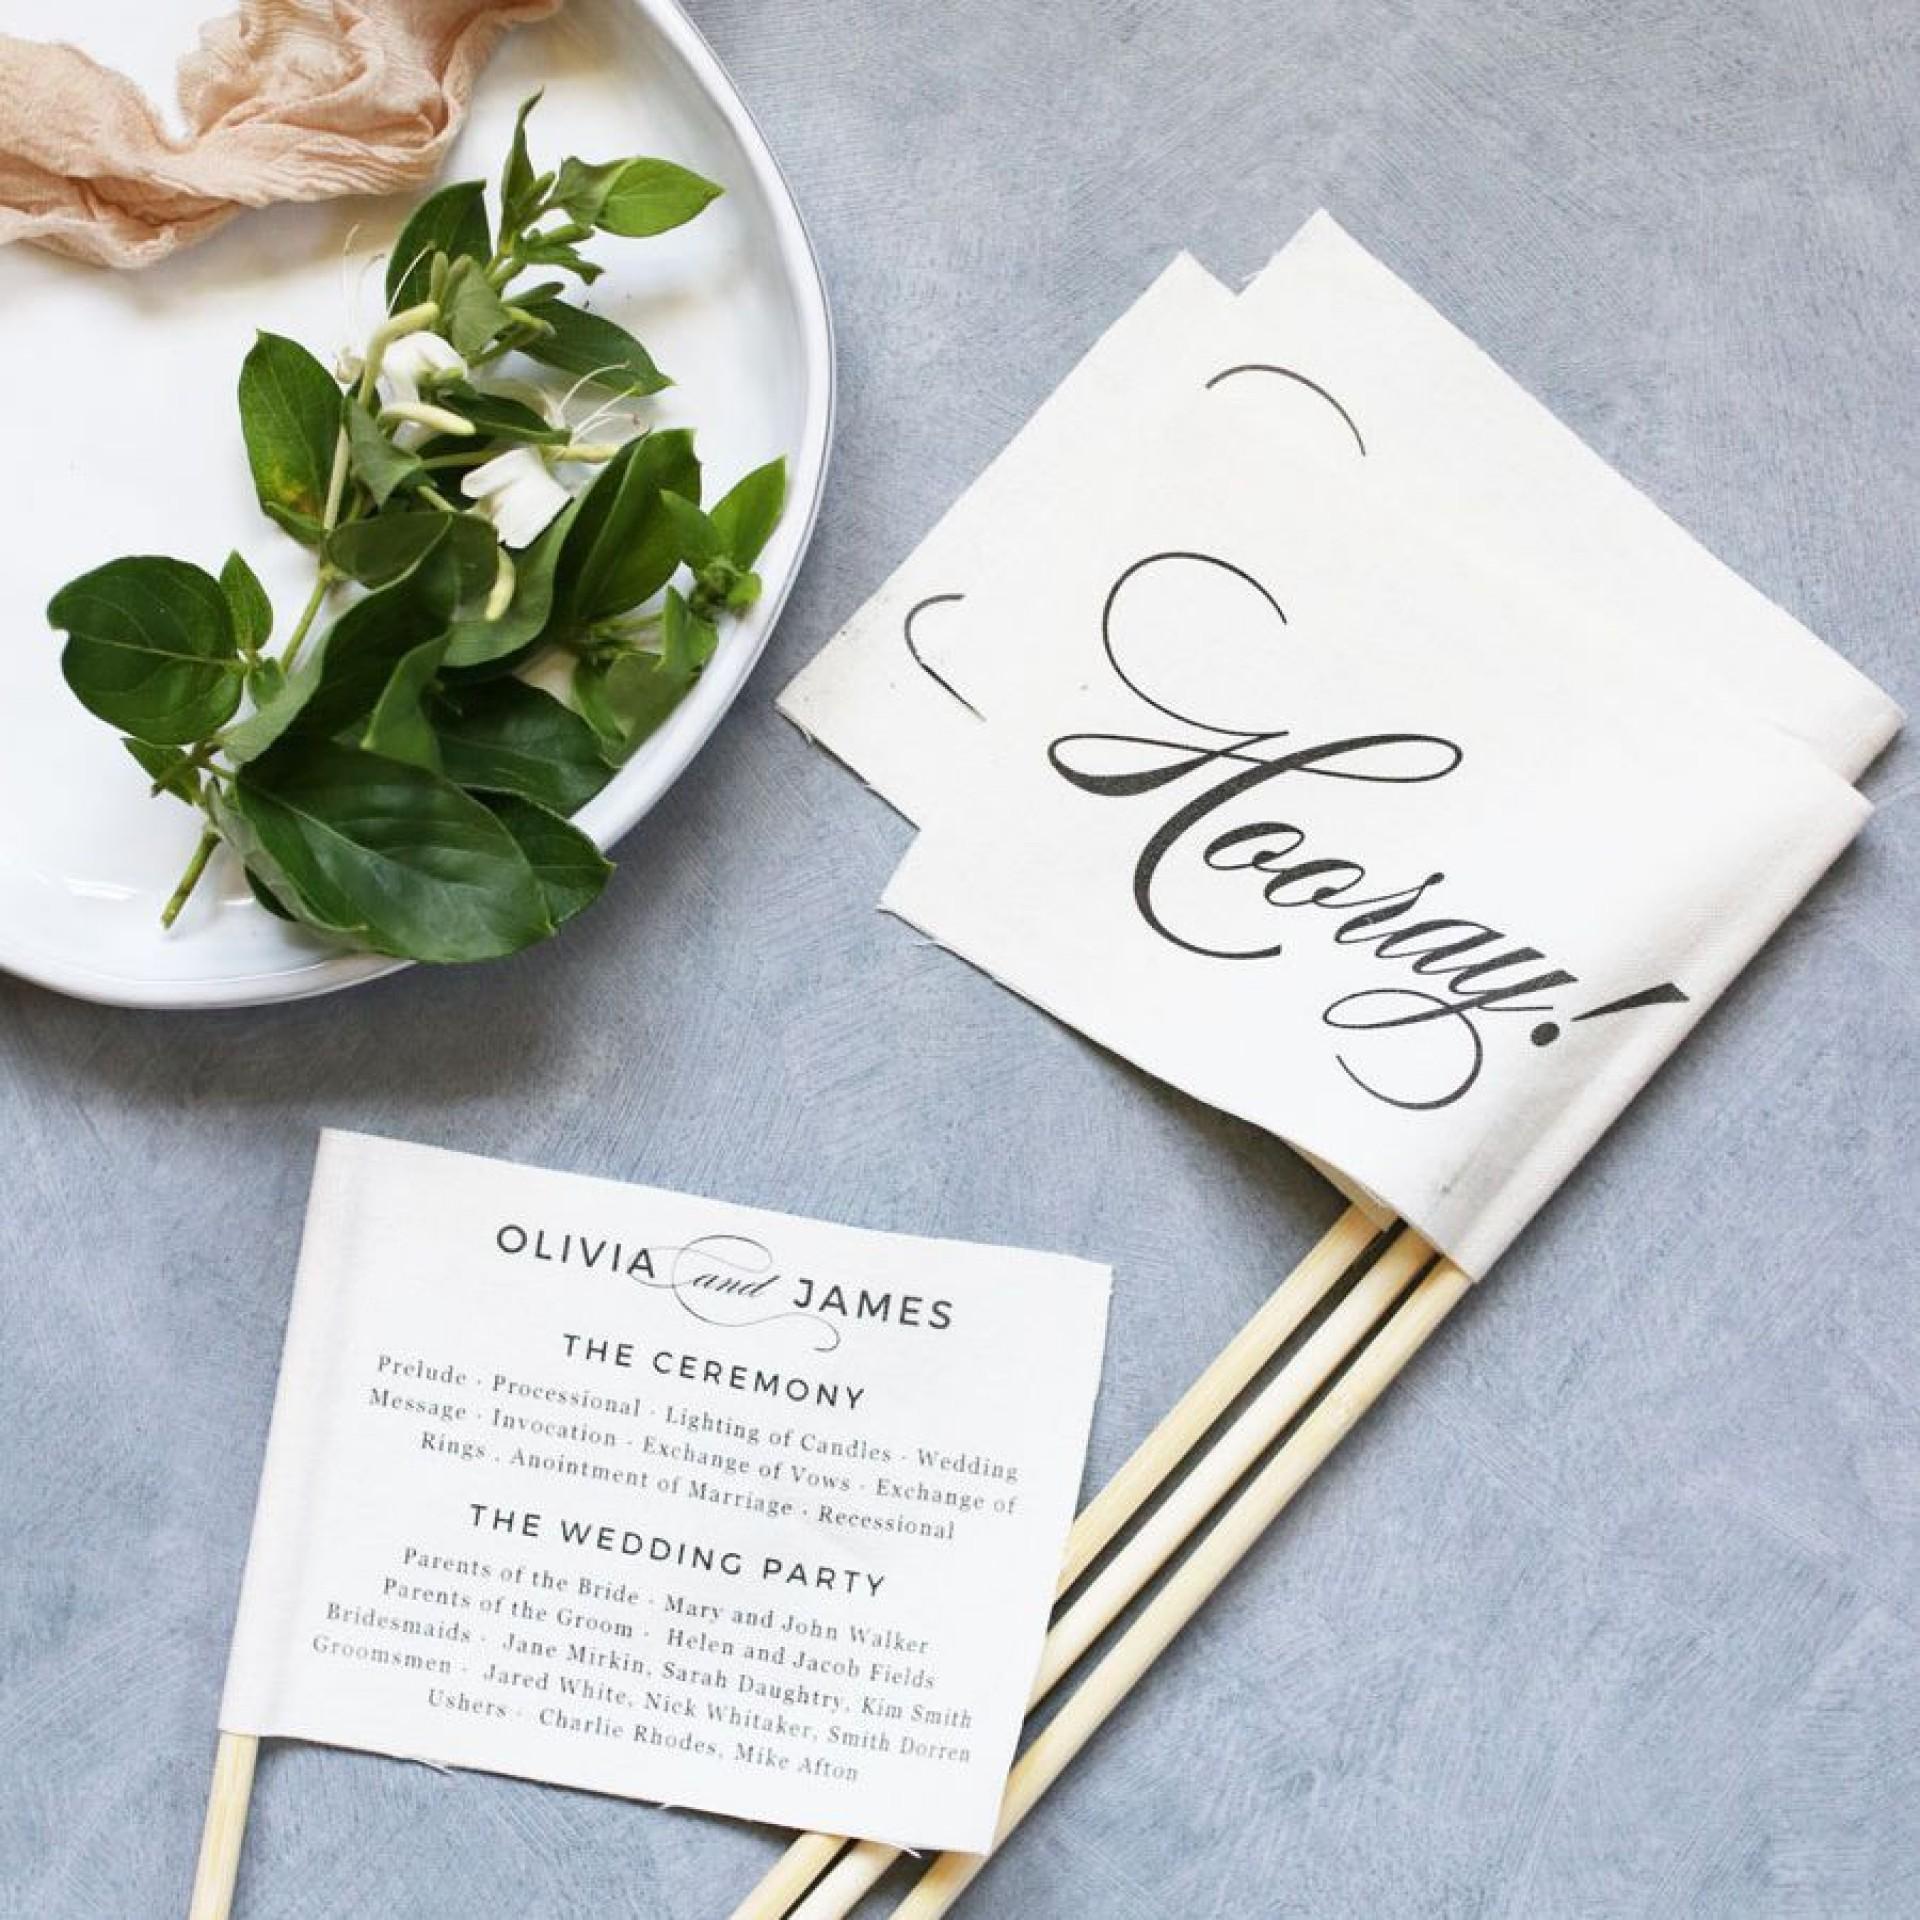 009 Dreaded Trifold Wedding Program Template High Resolution  Tri Fold Word Folded Example1920